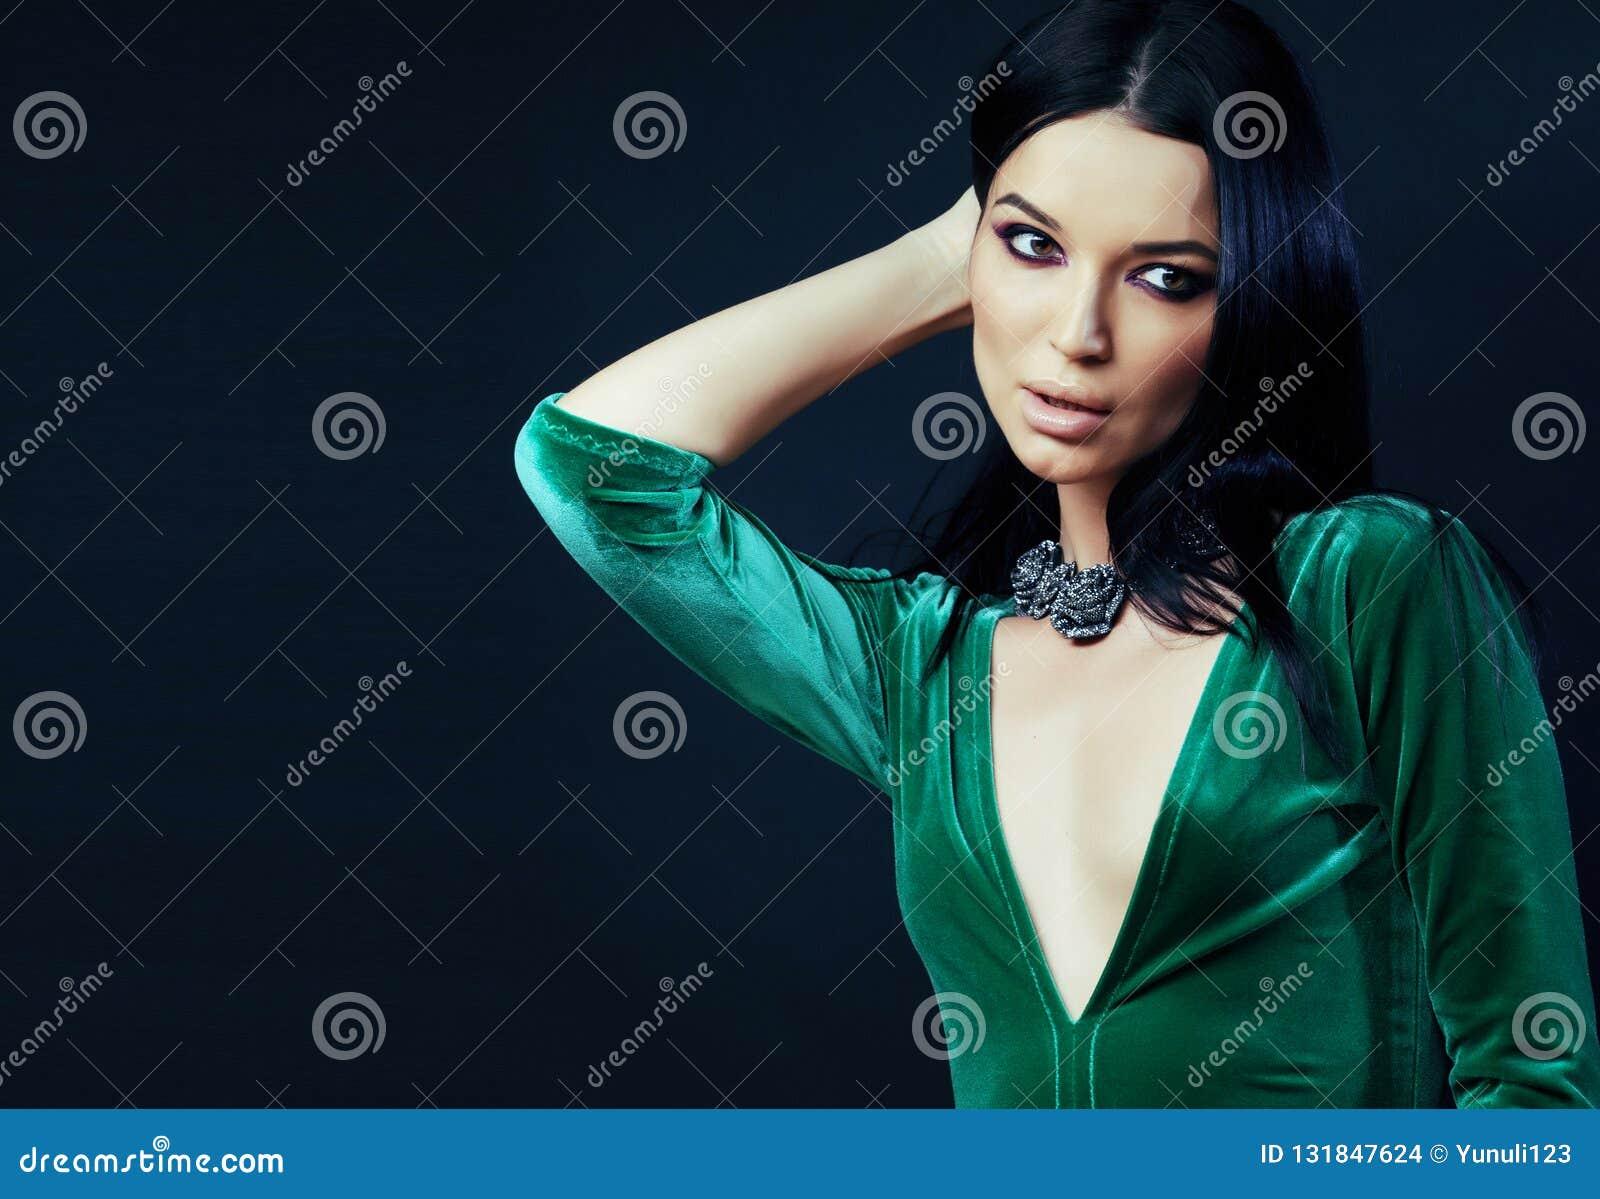 young pretty brunette woman fashion dressed, bright makeup, eleg